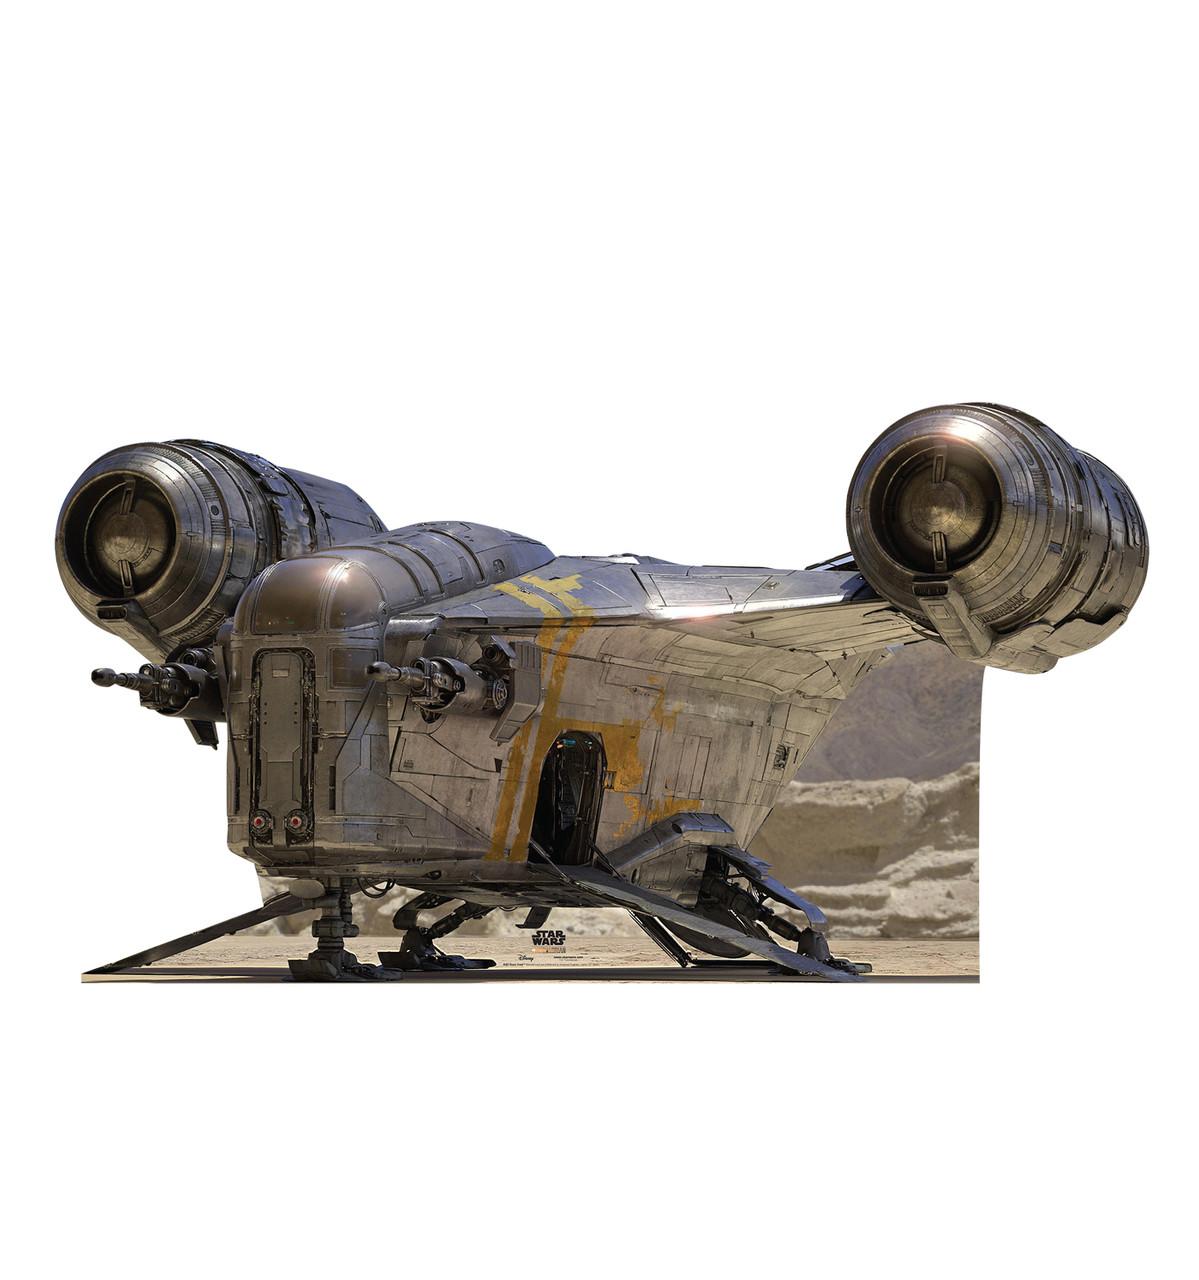 Life-size cardboard standee of the Razor Crest from the Mandalorian season 2.